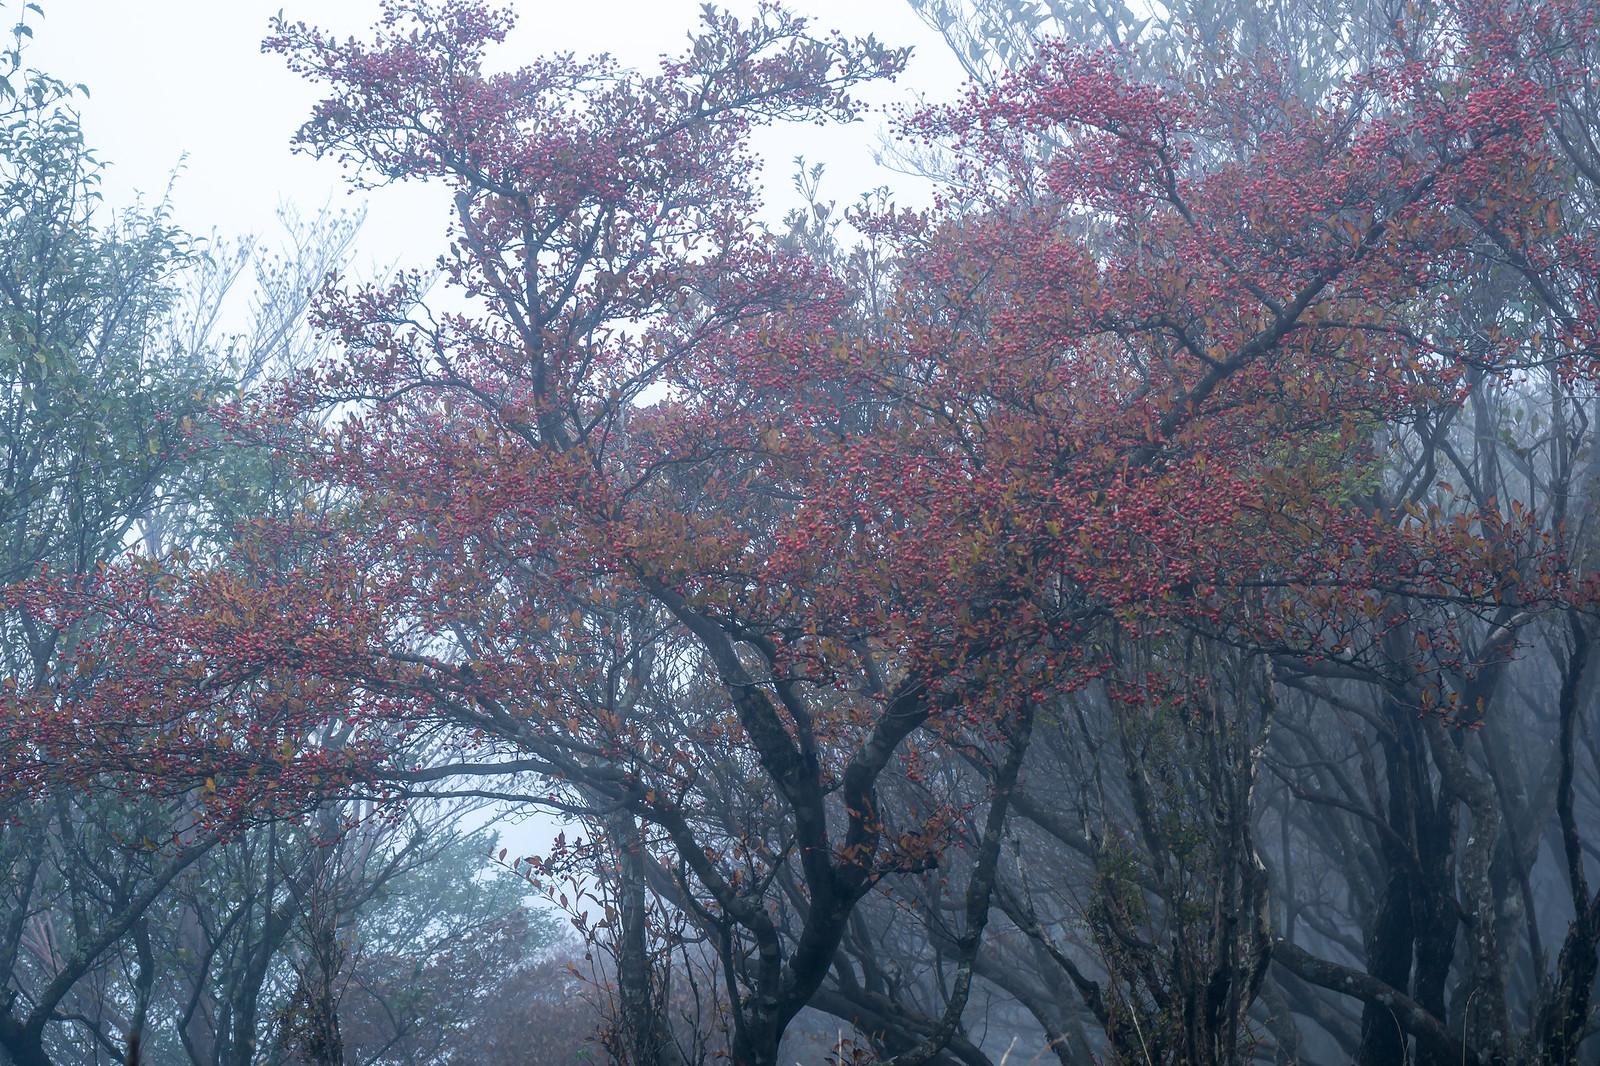 Berries in a fog